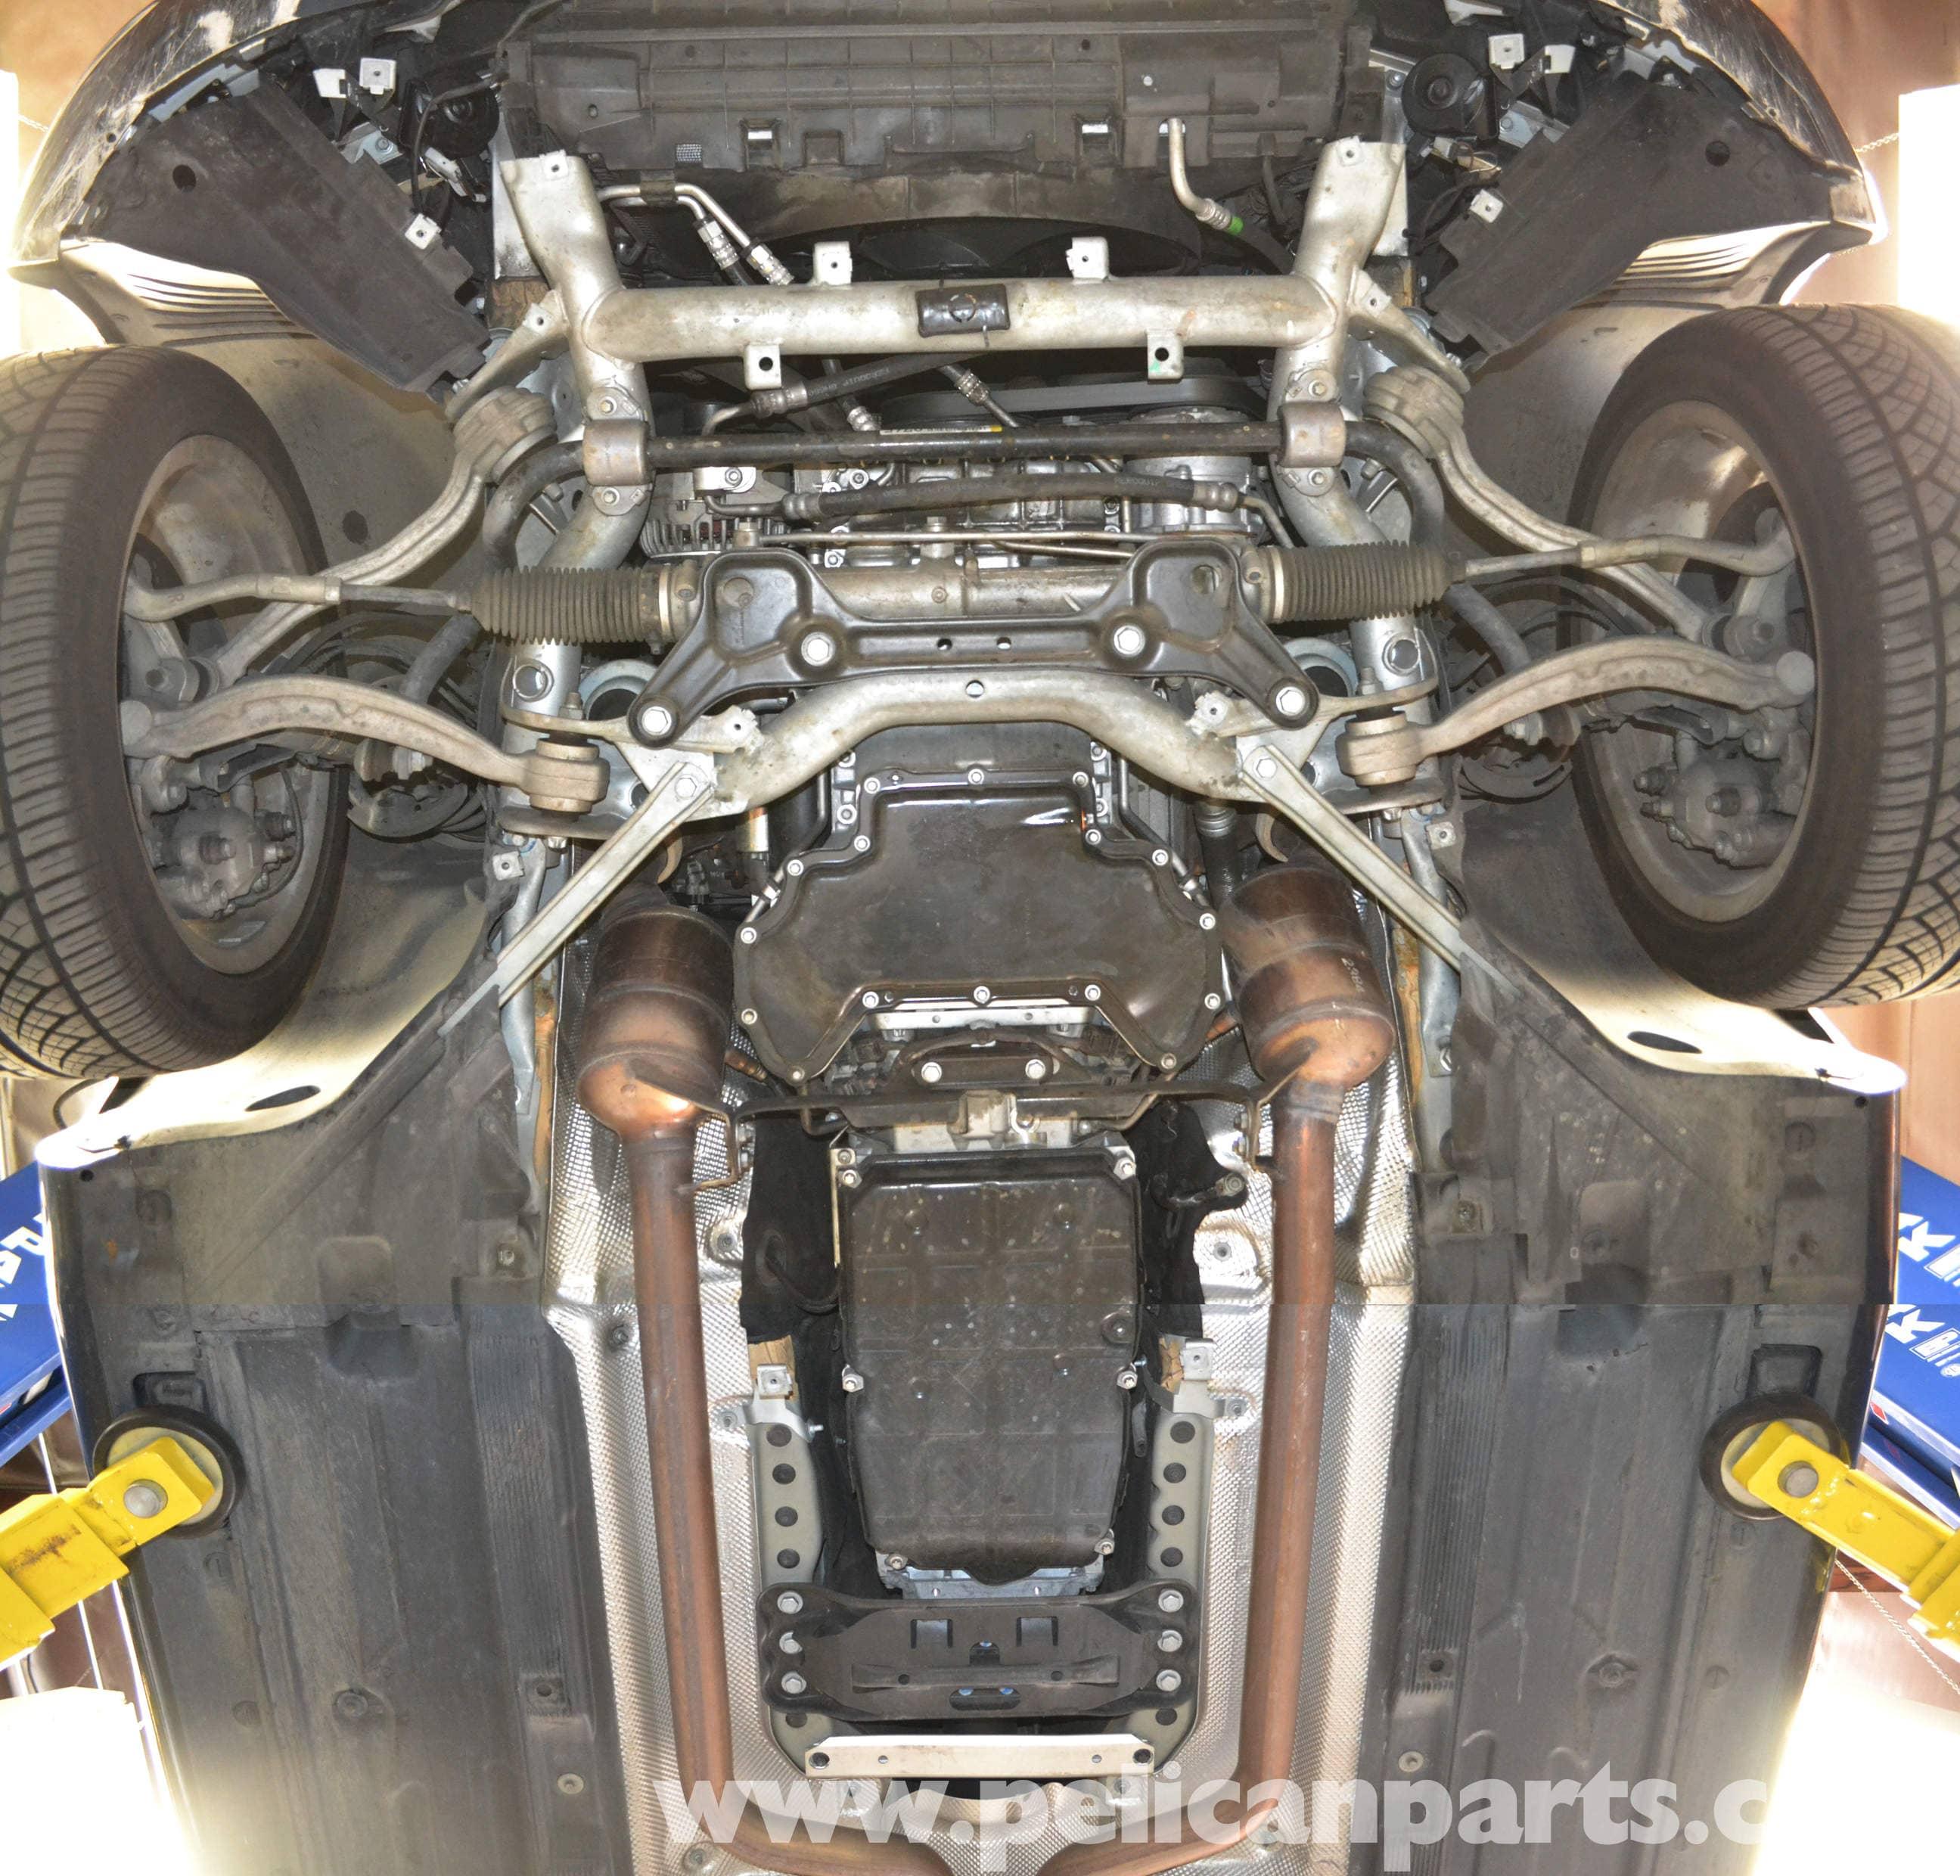 Mercedes Benz W204 Underbody Tray Removal 2008 2014